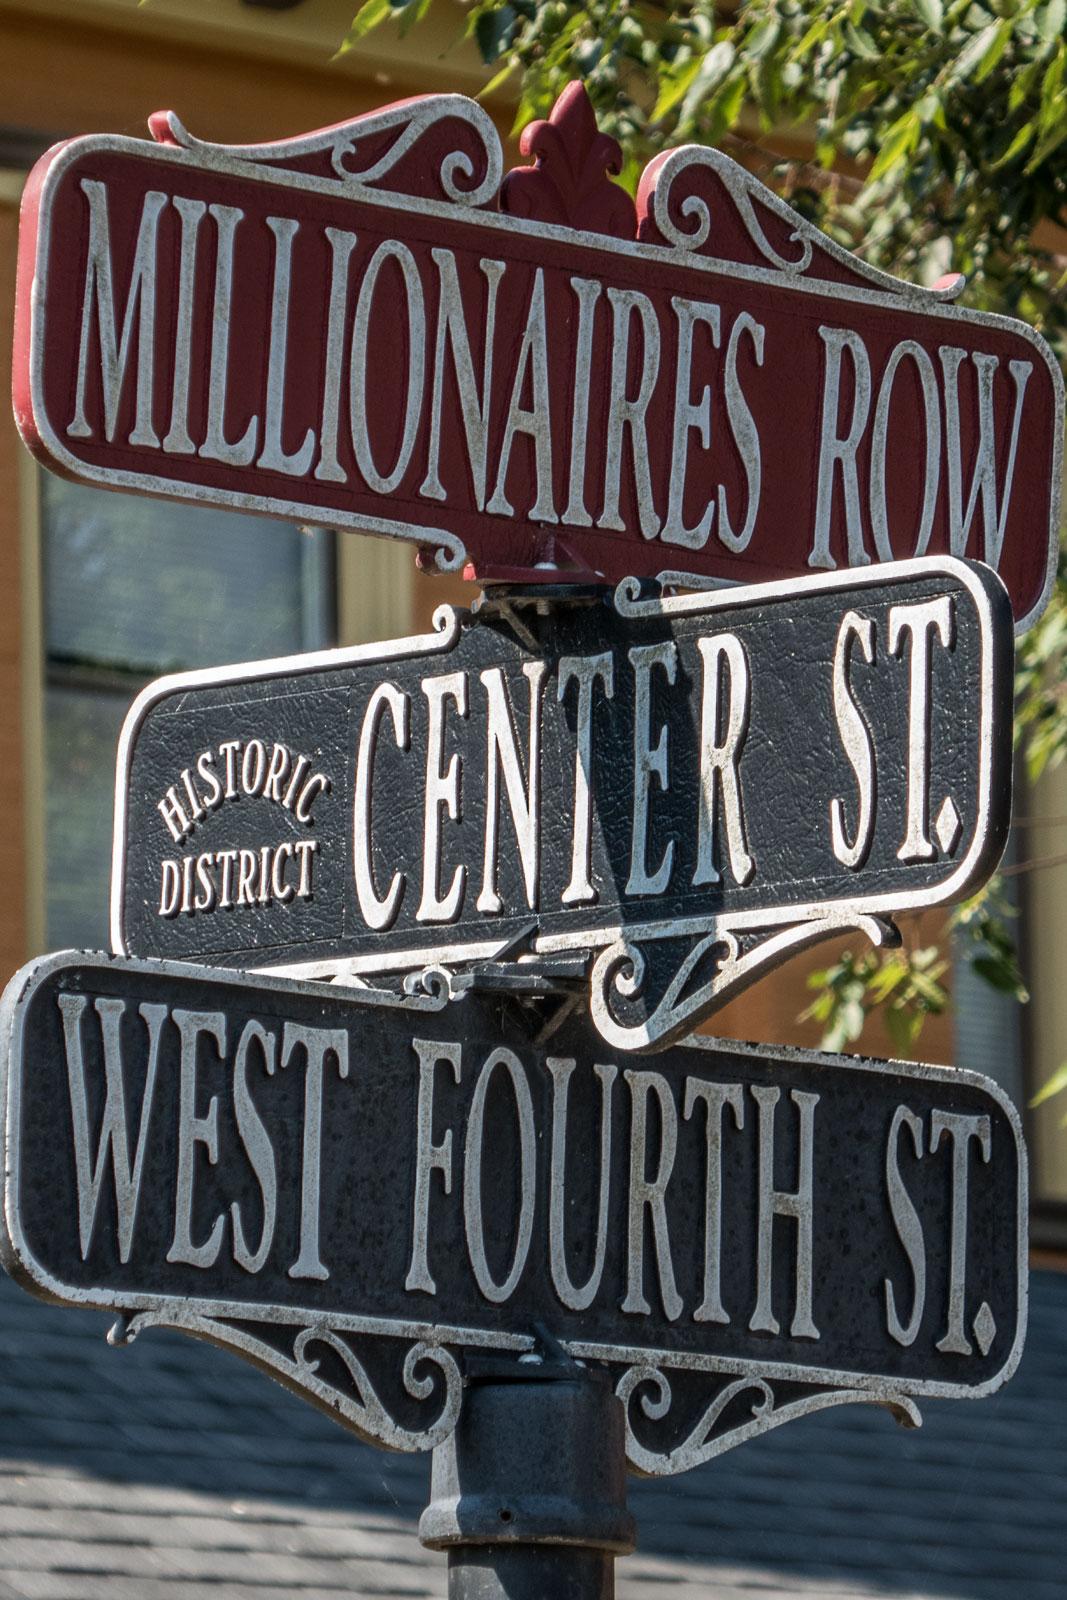 Millionaire's-Row-Williamsport-1067x1600